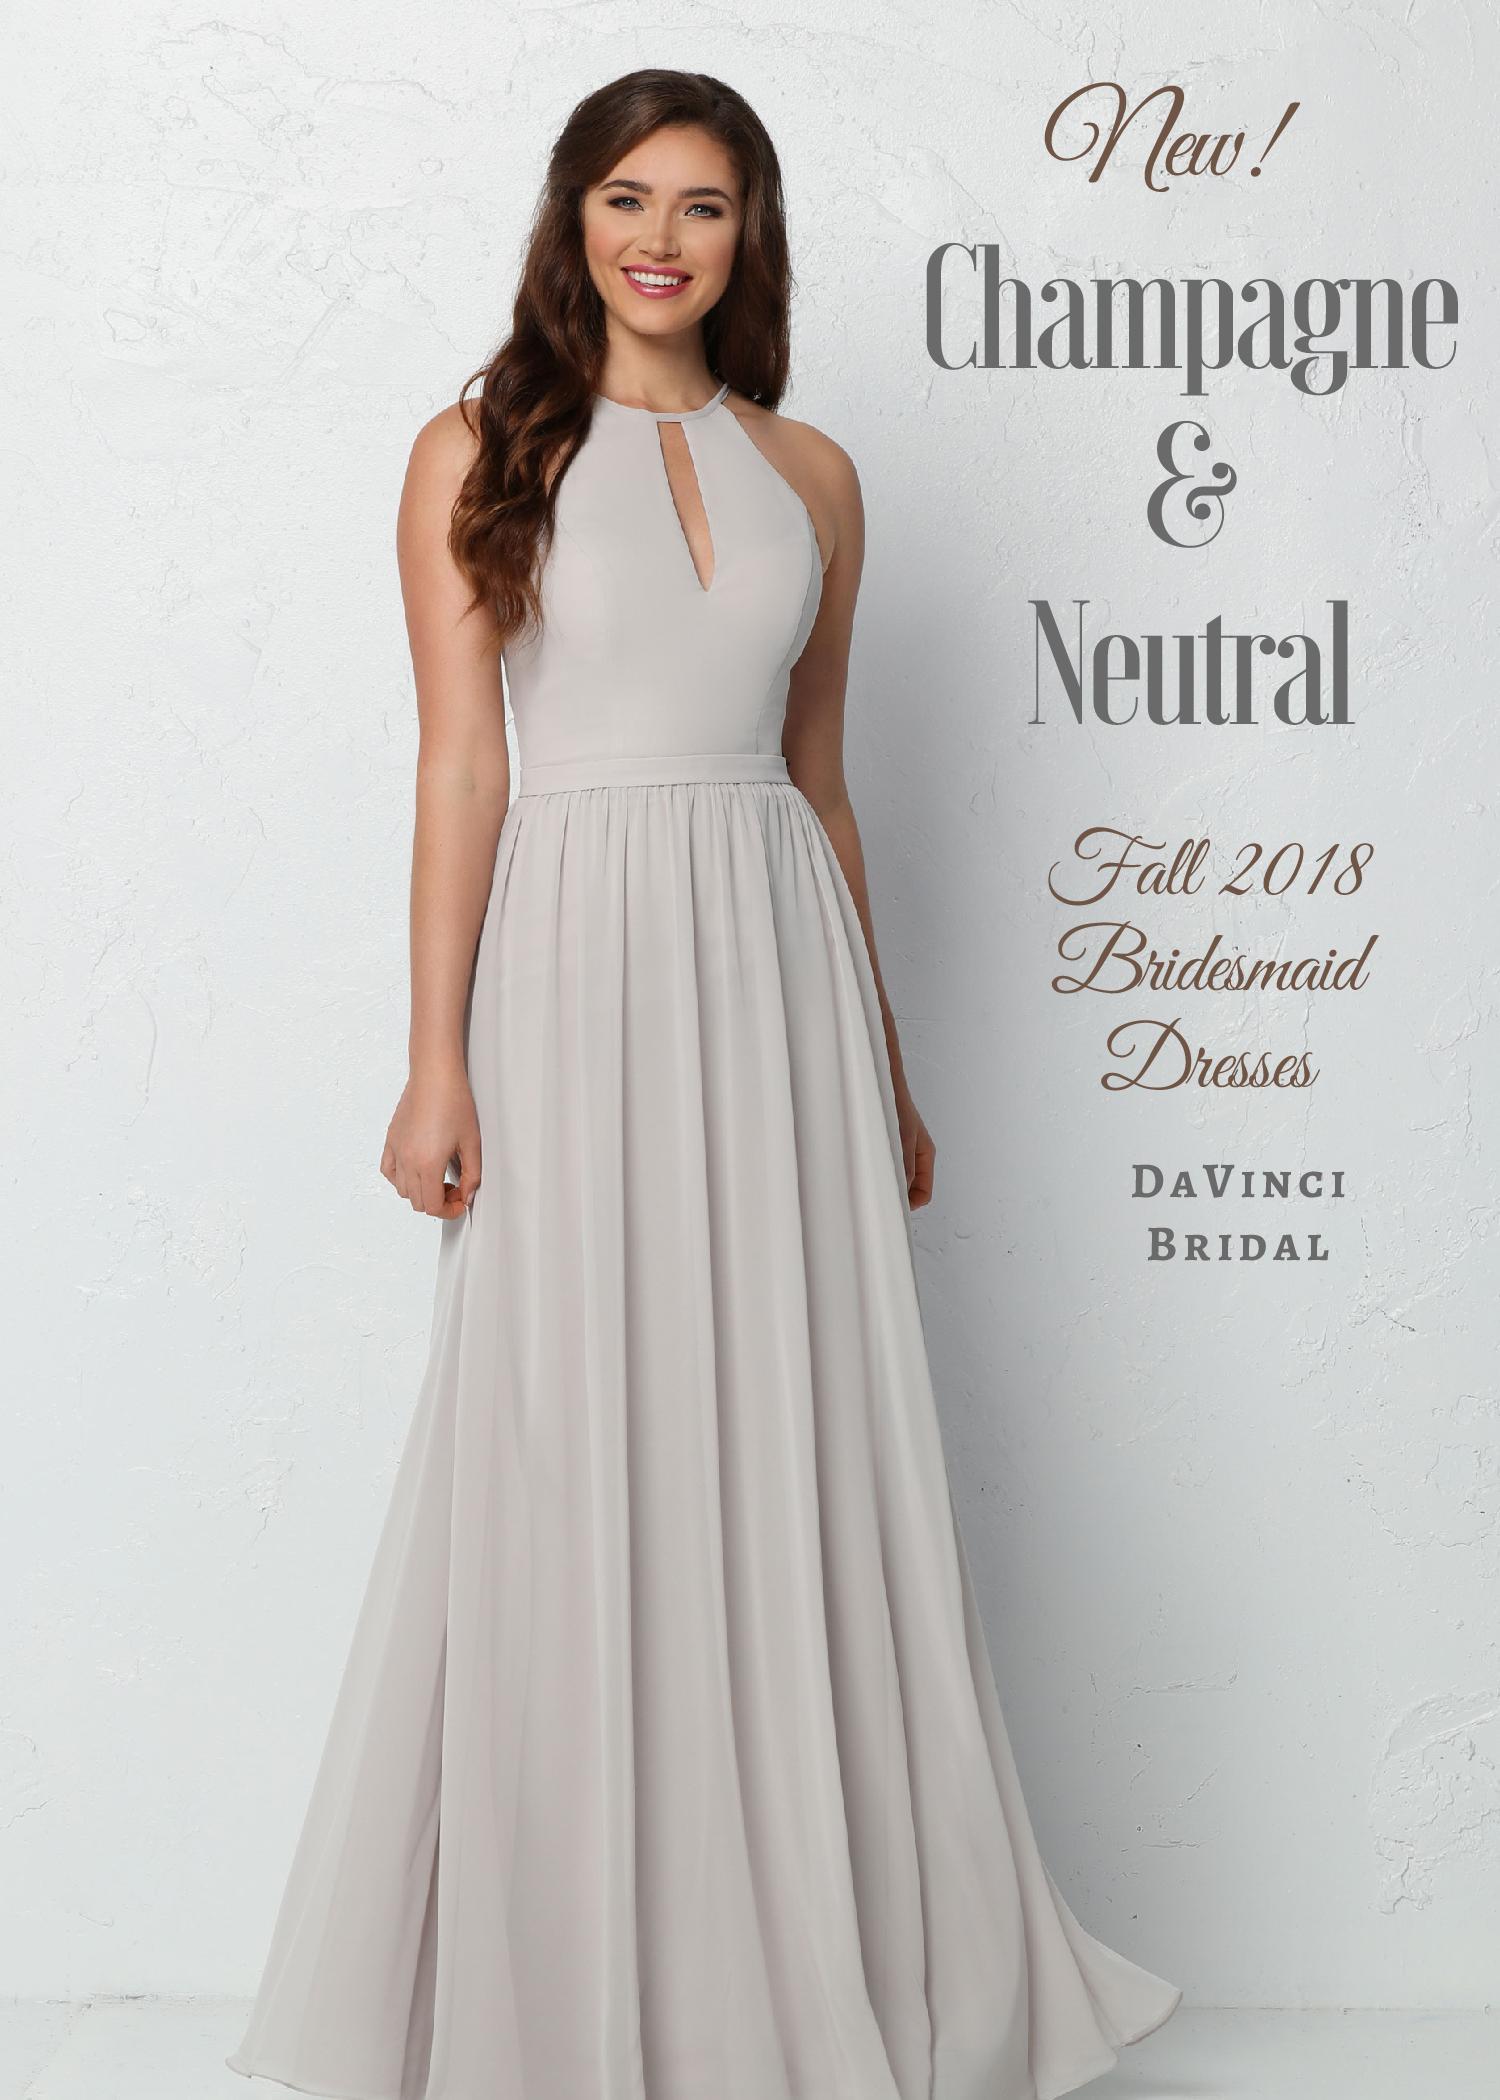 38d283f60c Champagne   Neutral Colored Bridesmaid Dresses – Fall 2018 DaVinci Bridal  Blog